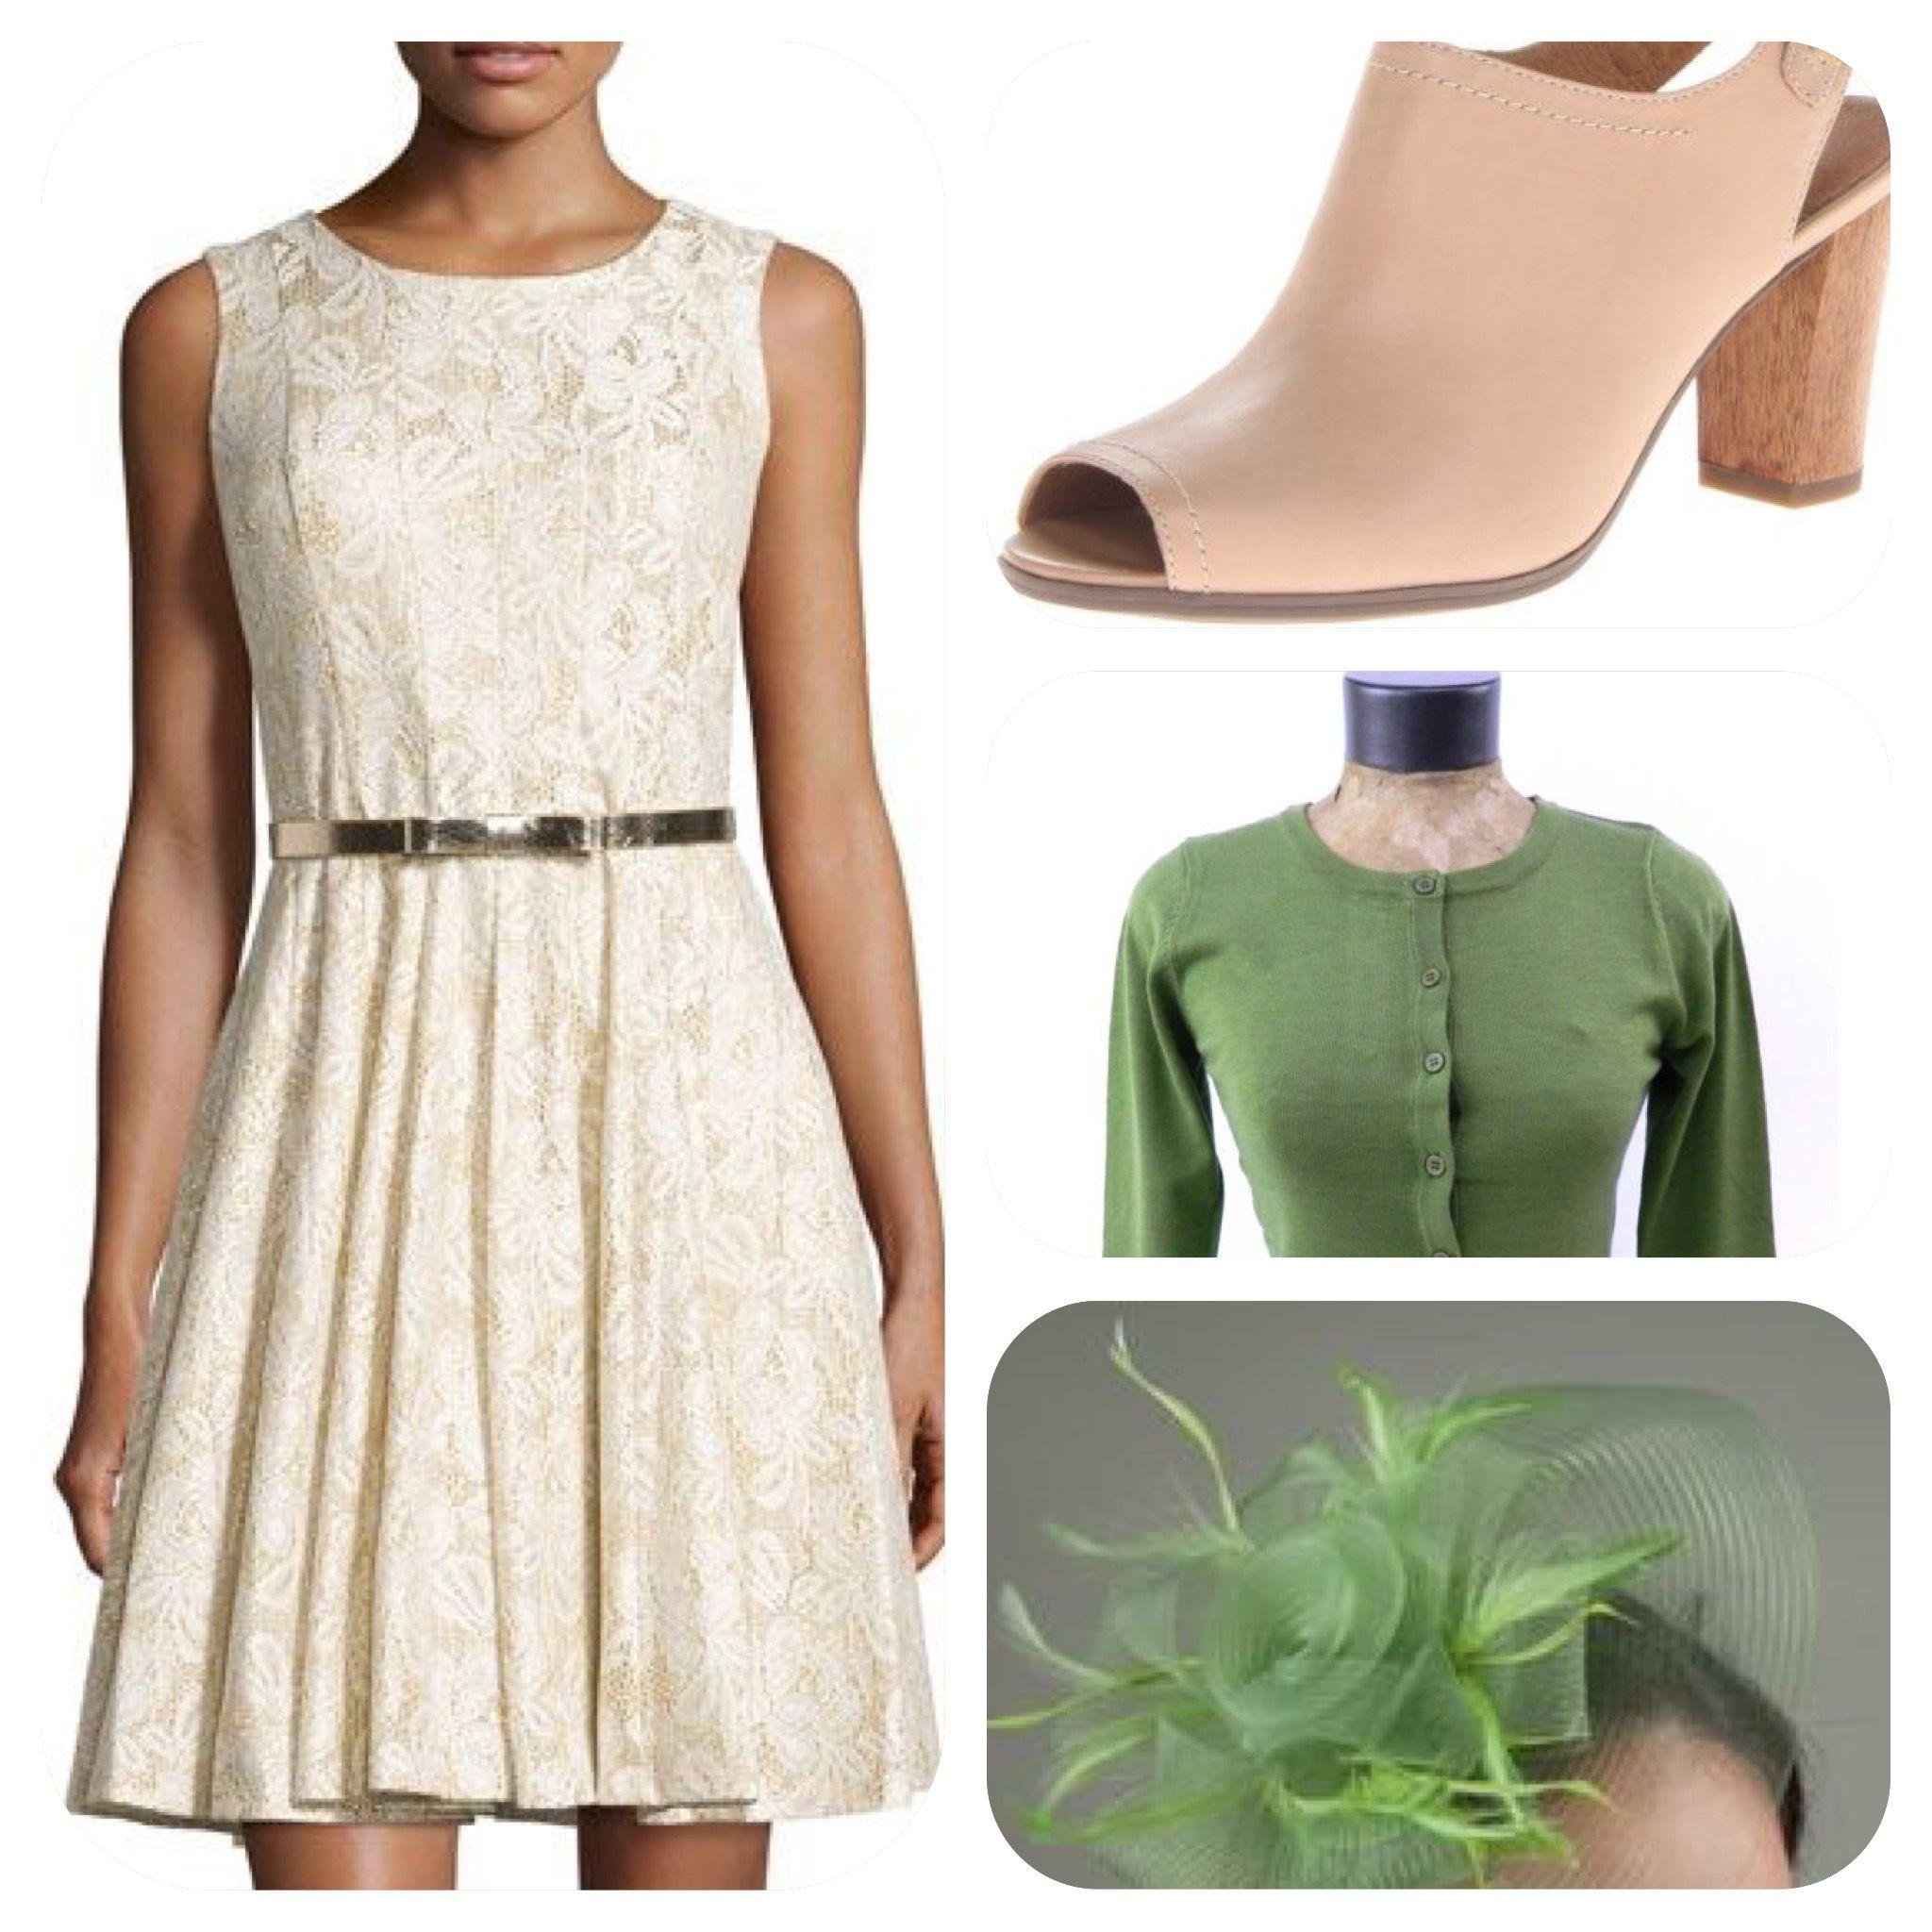 Outfit for the Ballet's Nutcracker Tea